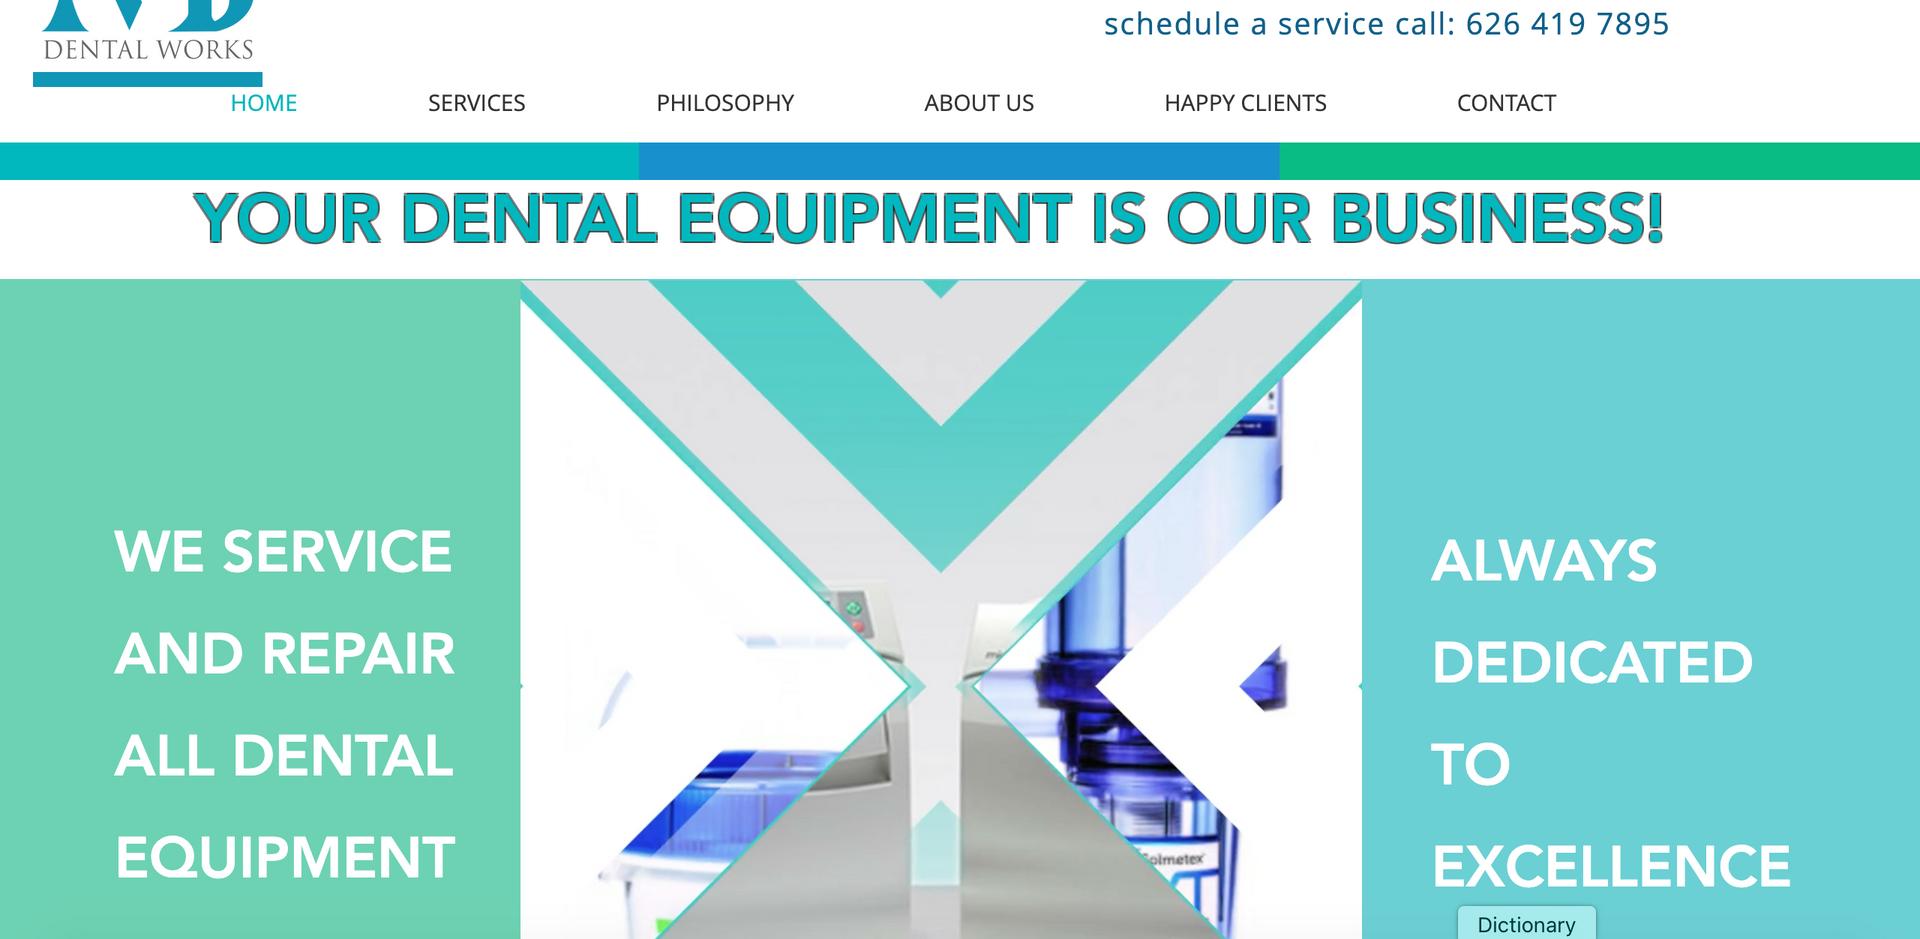 PROJECT: Dental Repair Equipment